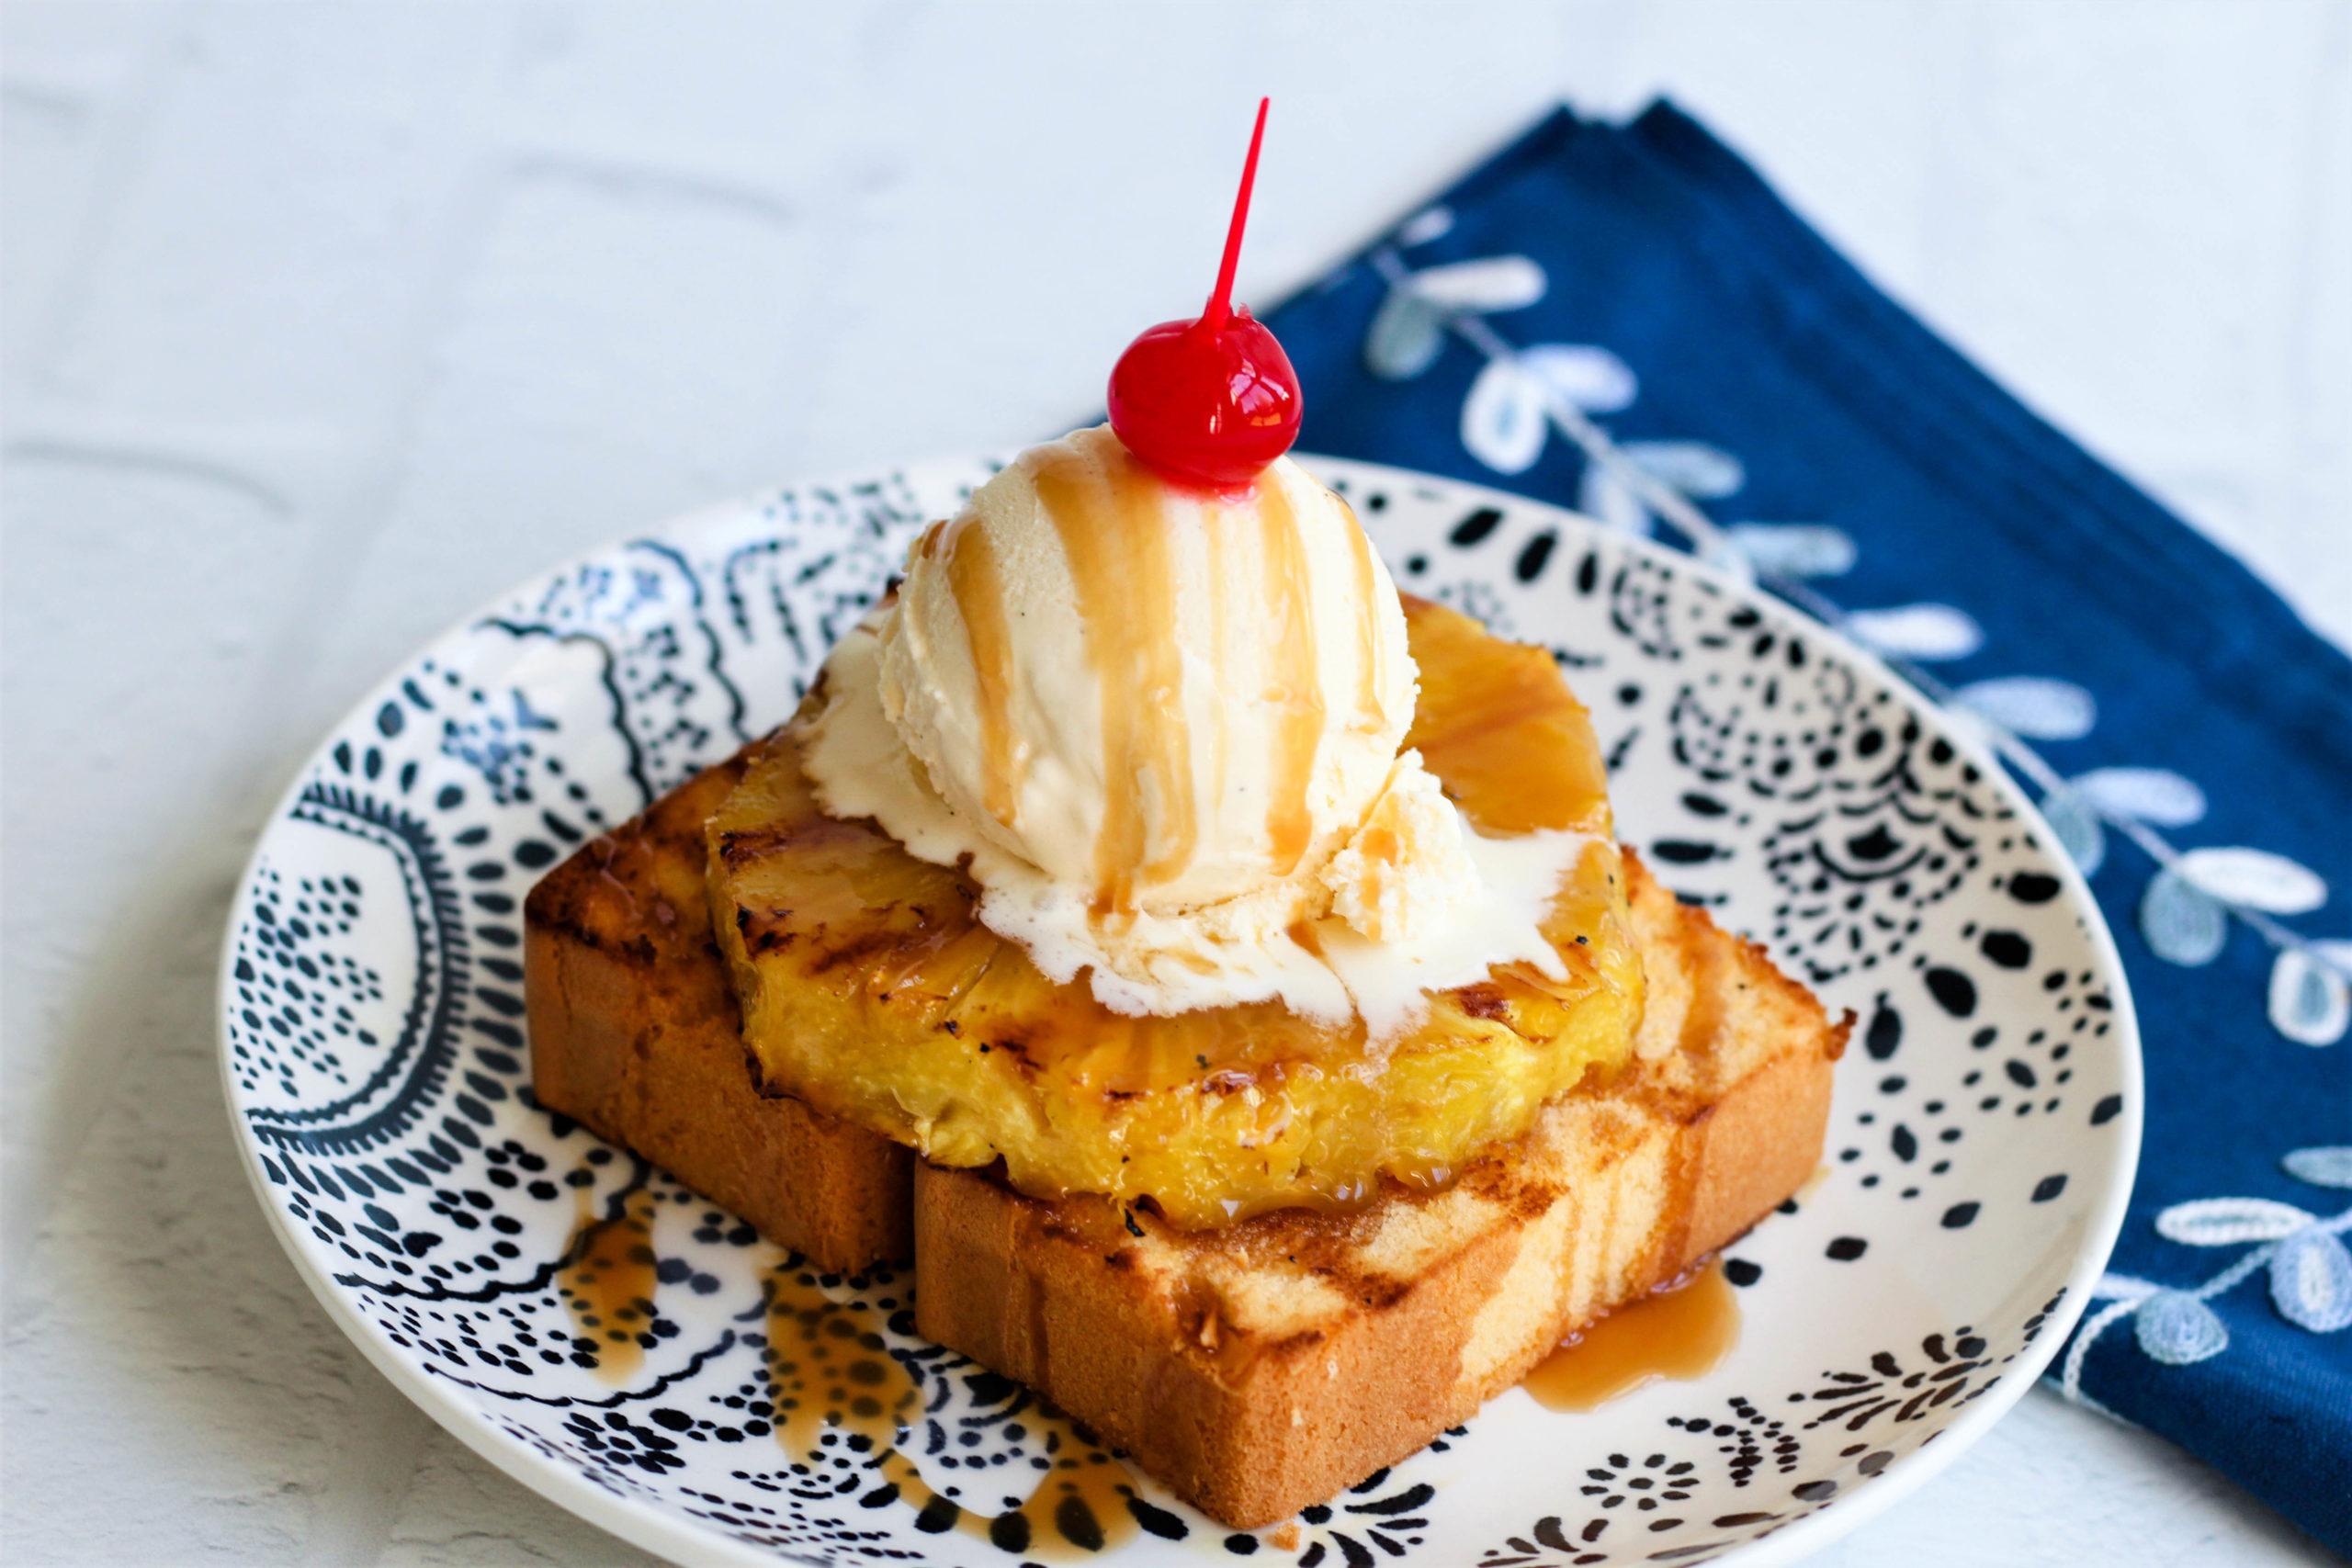 Slice of pineapple pound cake